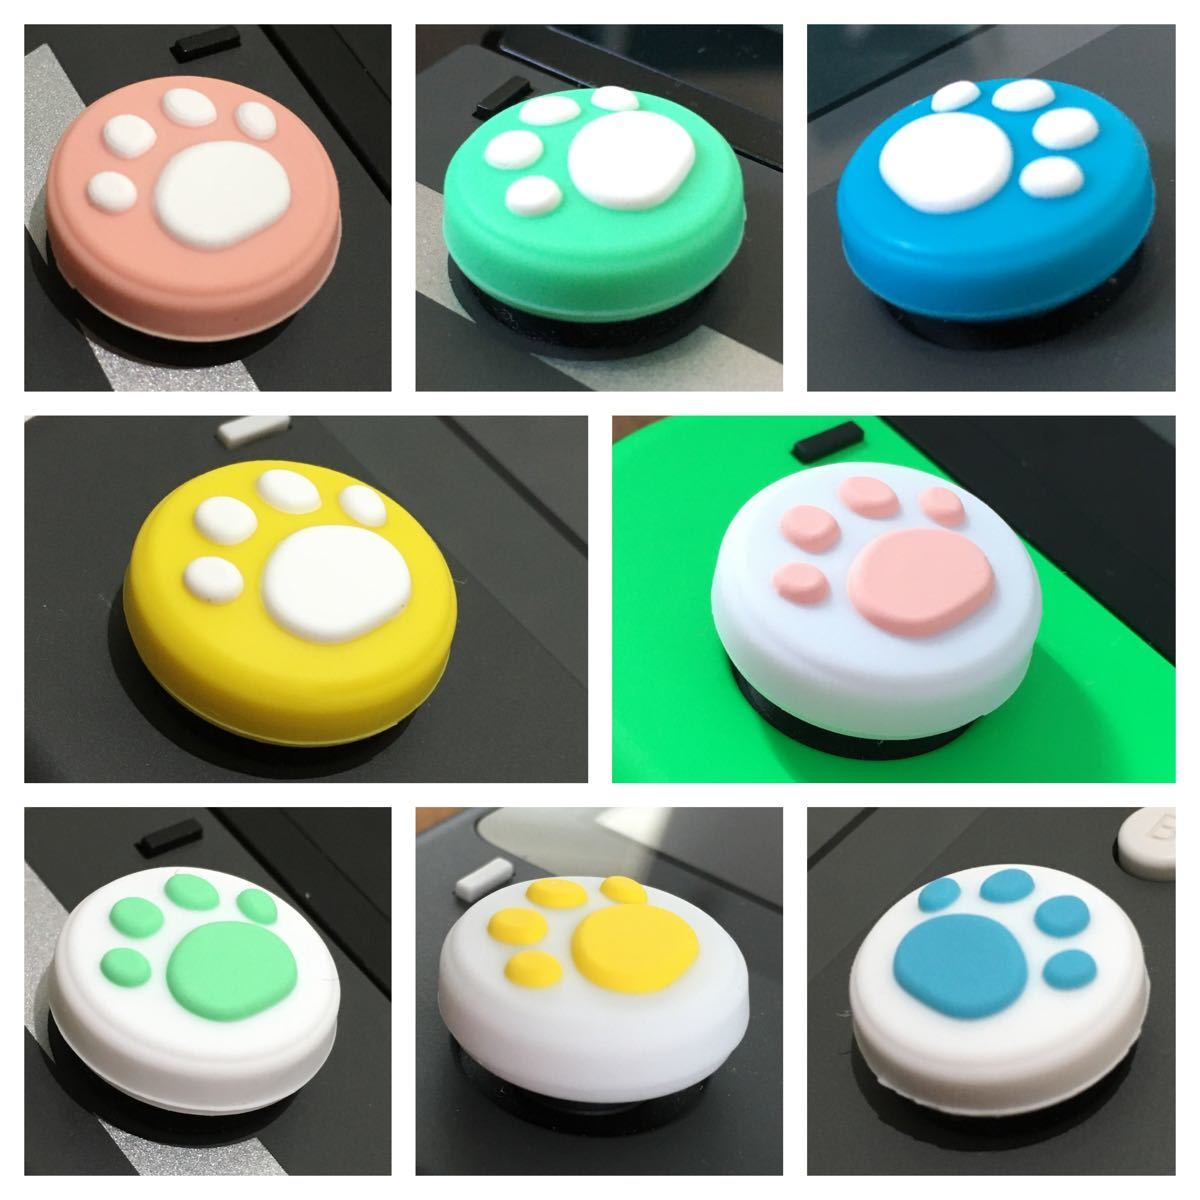 Nintendo Switch スイッチ ジョイコン スティックカバー 肉球【全色13個セット】